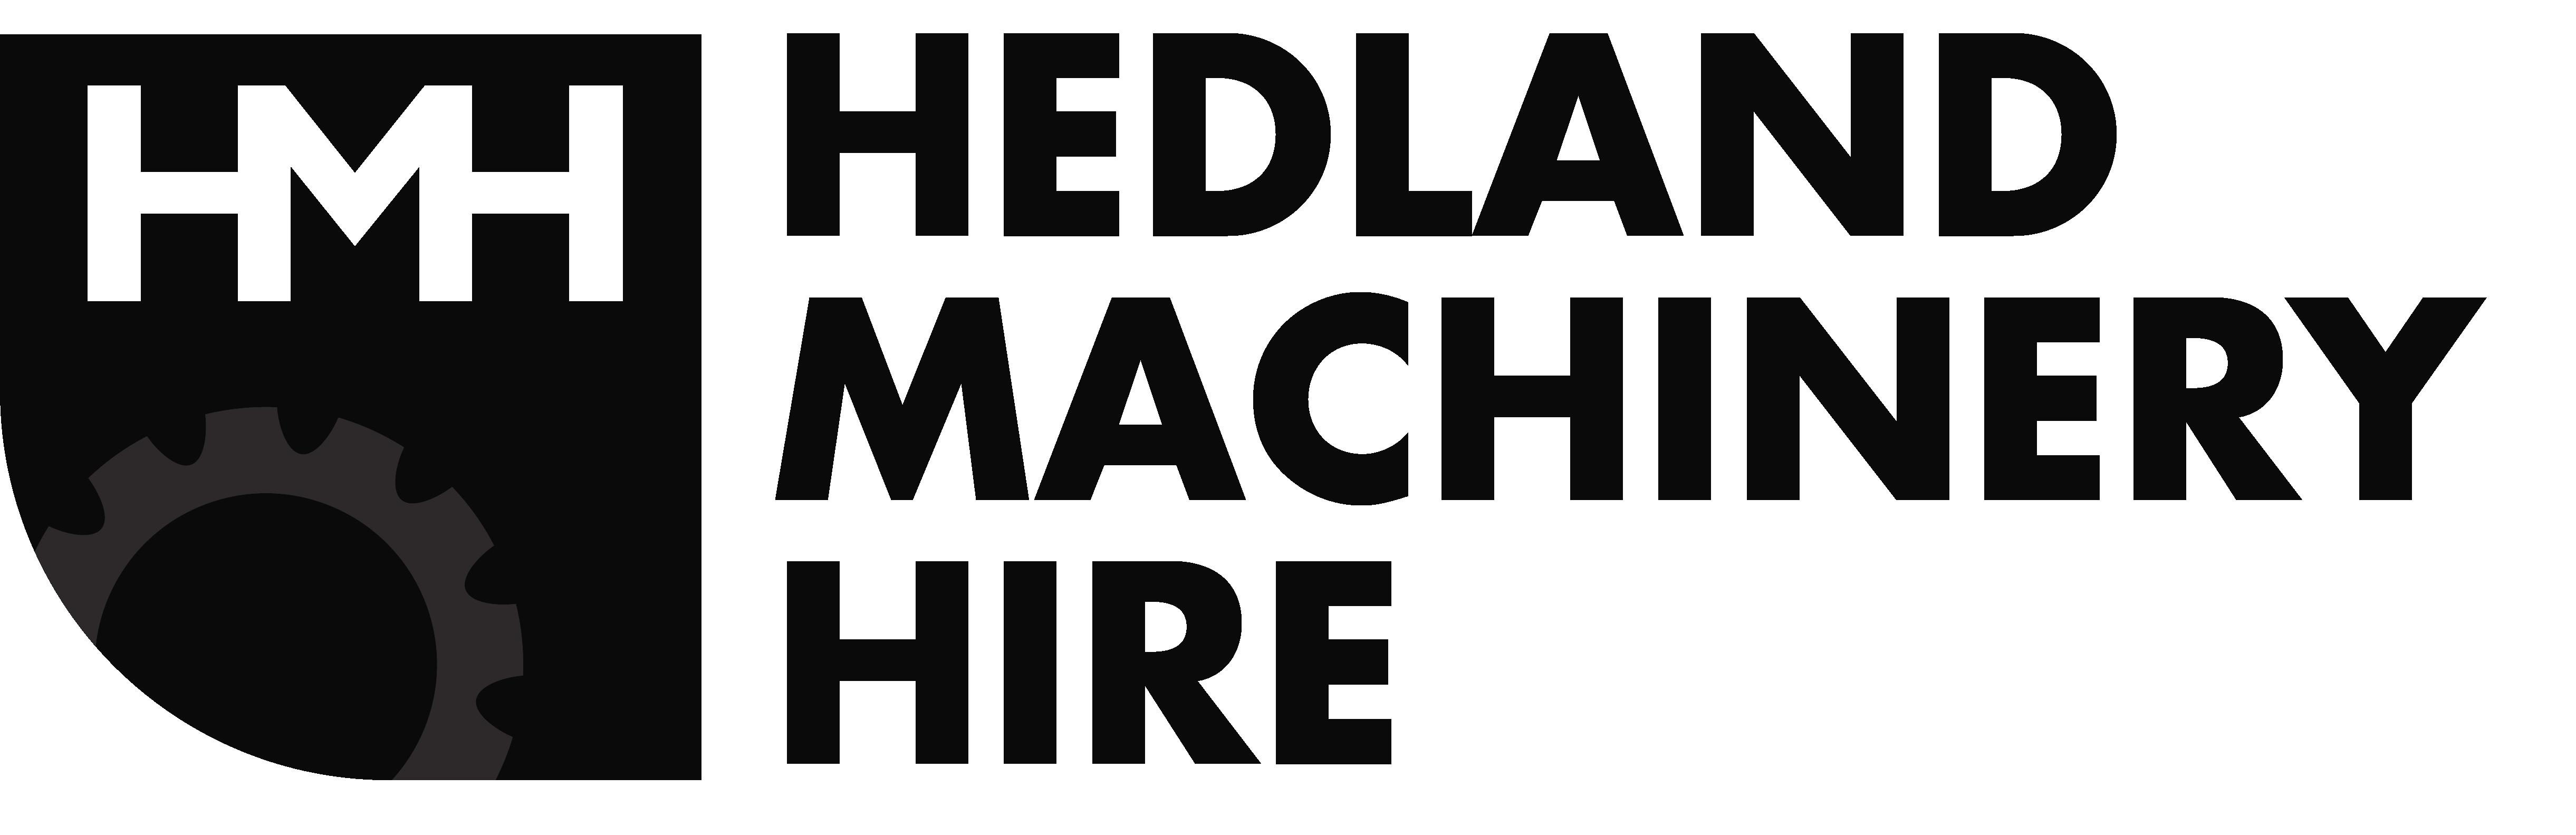 HMH Hedland Machinery Hire